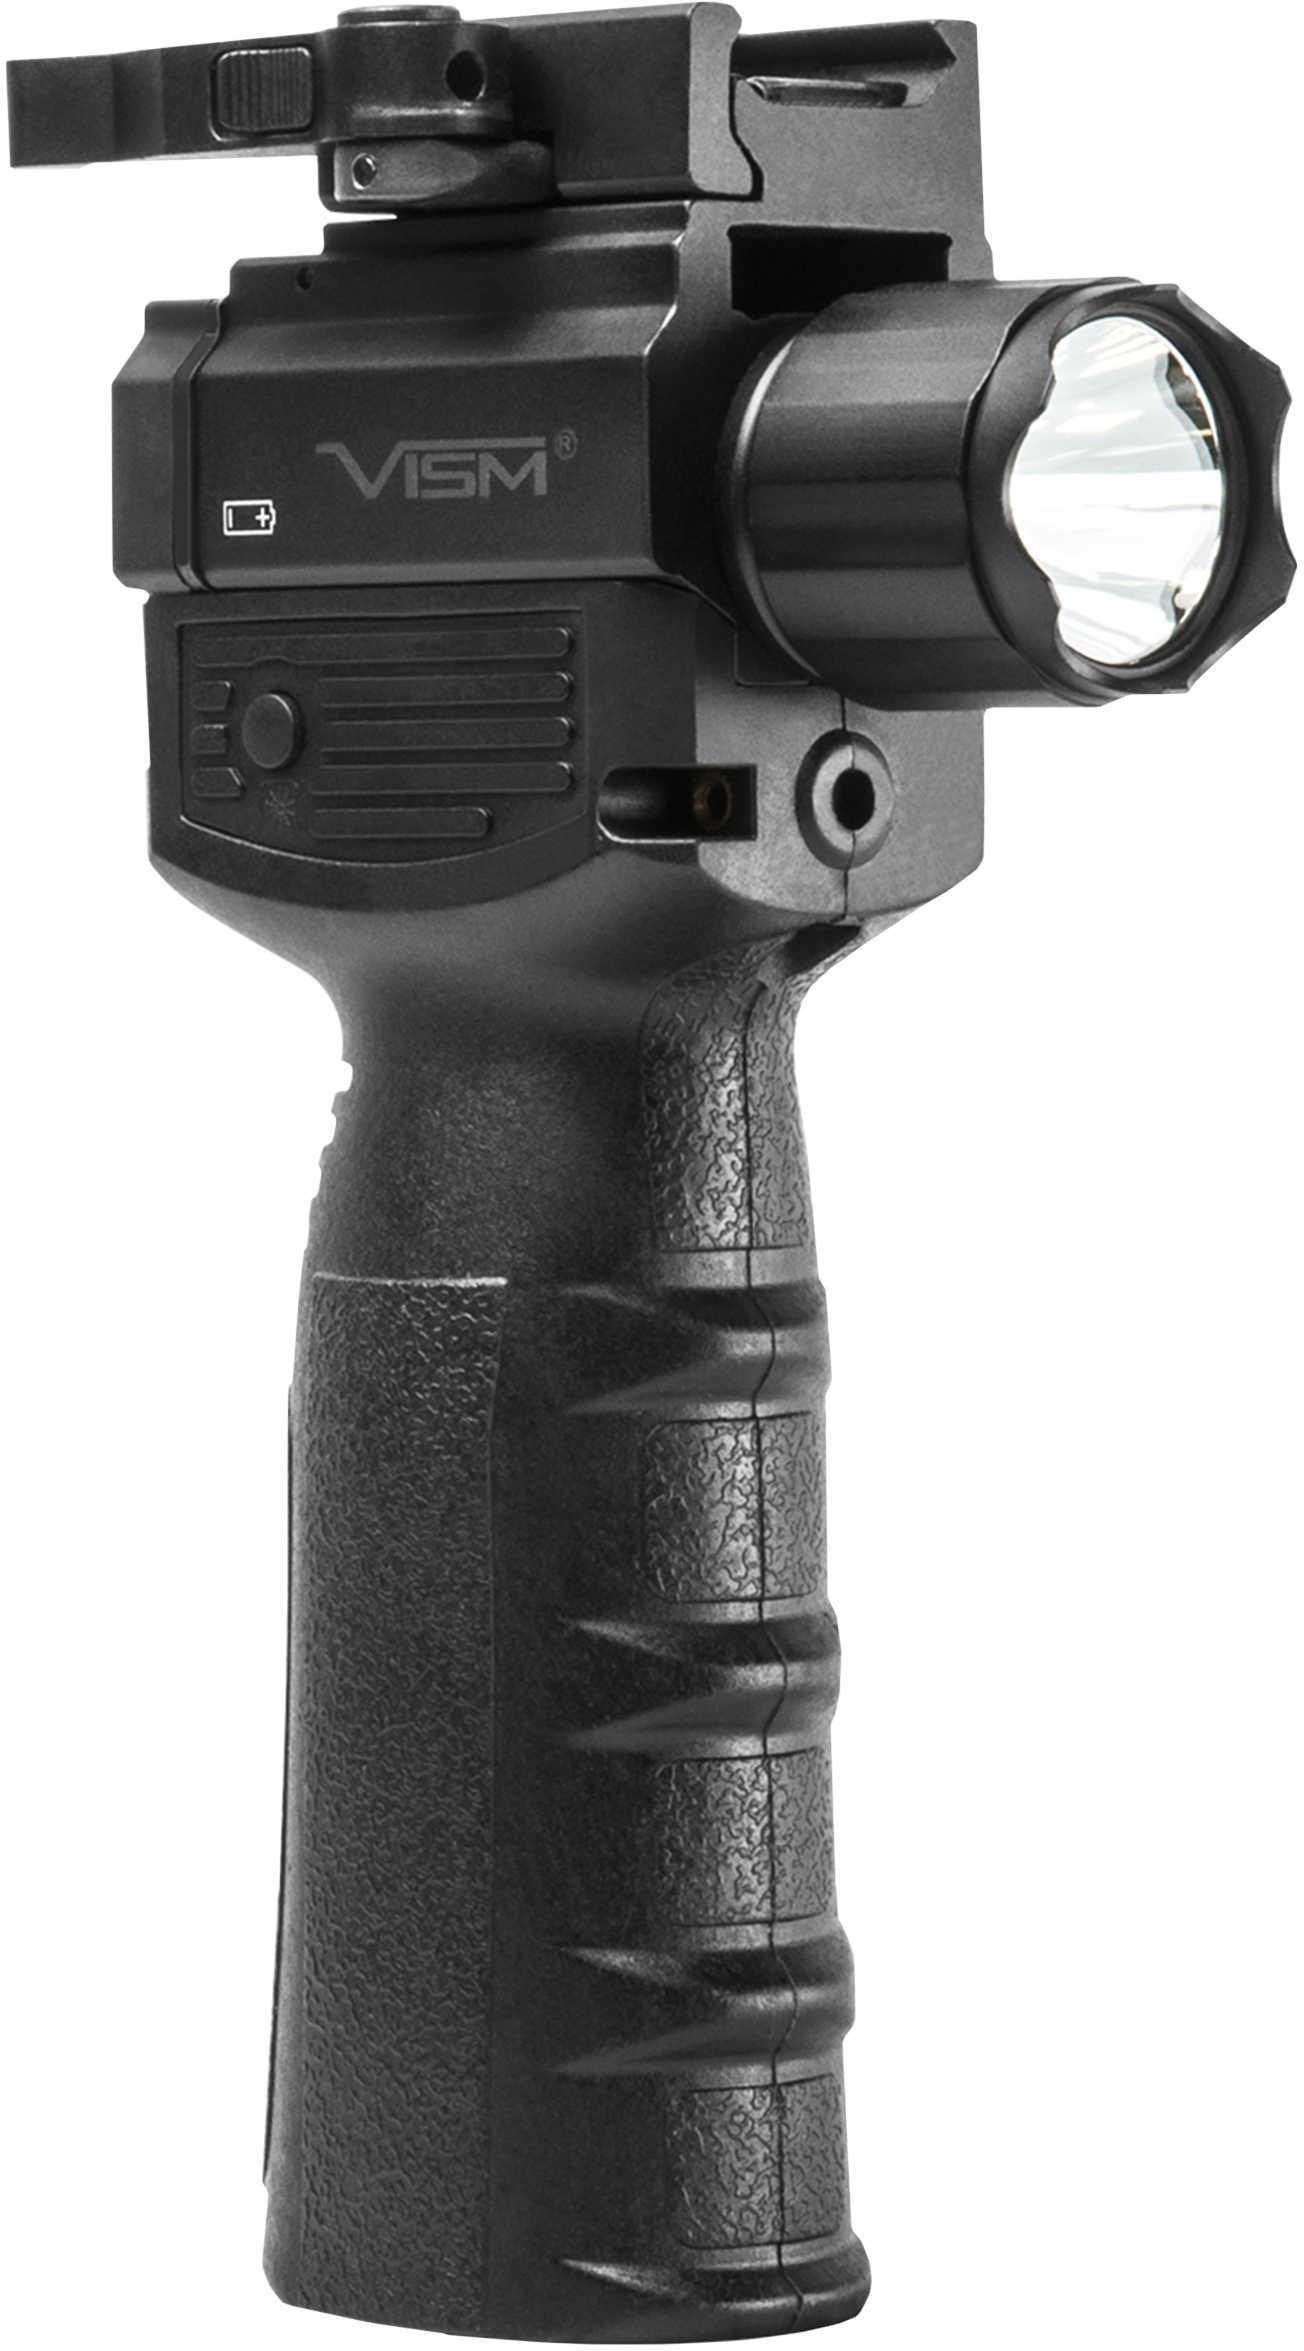 NcStar Vert Grip with Strobe Flashlight and ed Laser, Black Md: VAQVGFLRV2